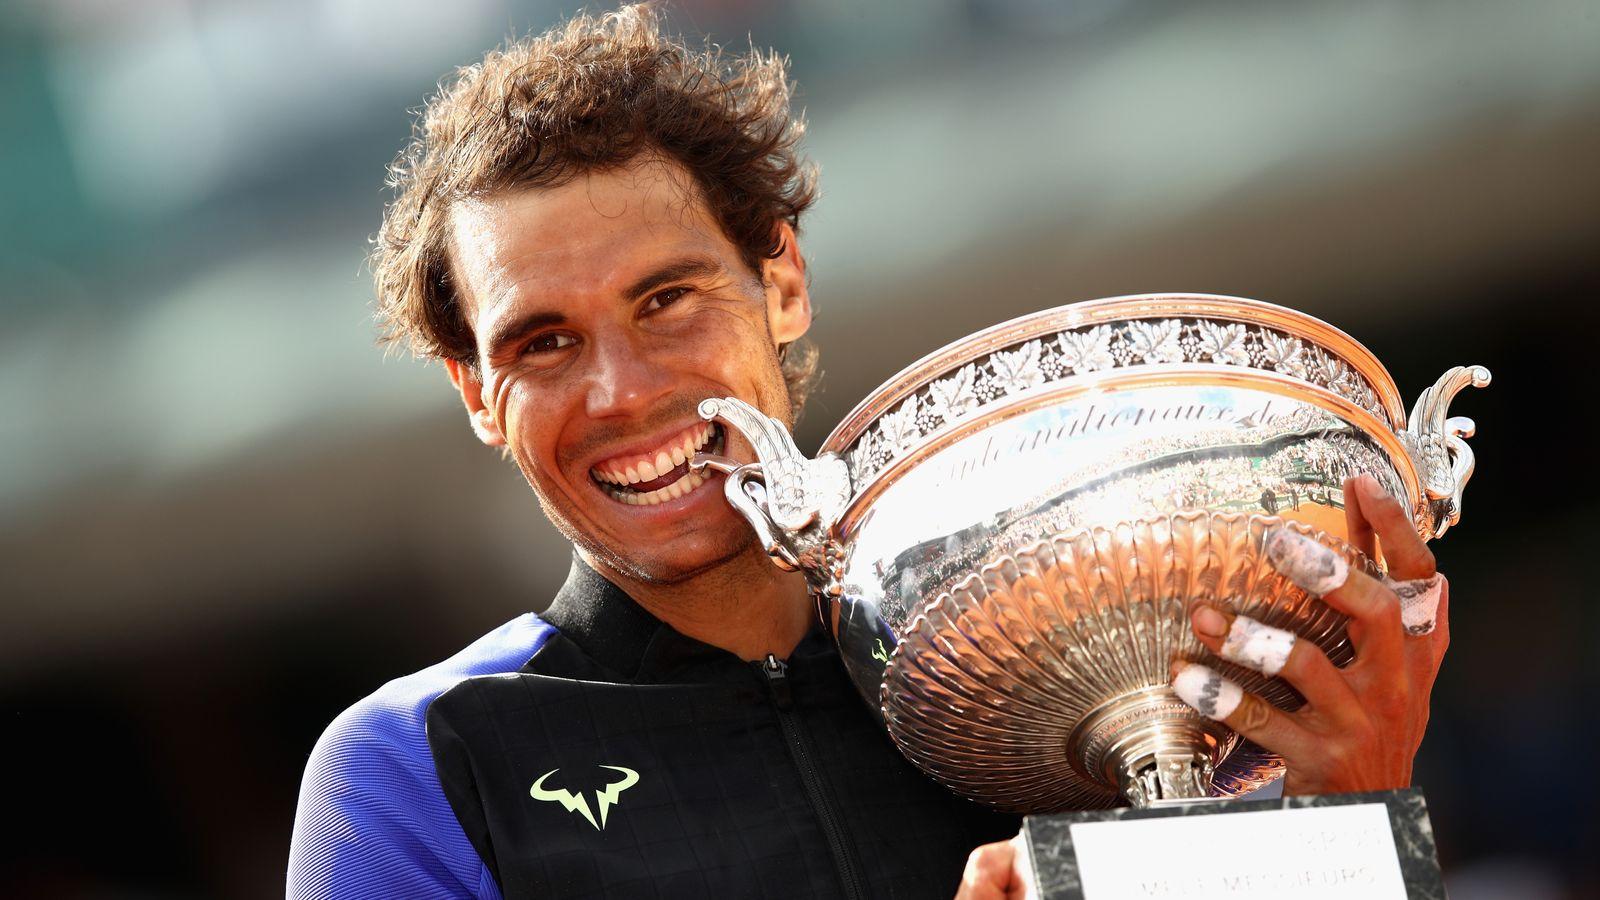 French Open: Men's Singles Draw | Tennis News | Sky Sports